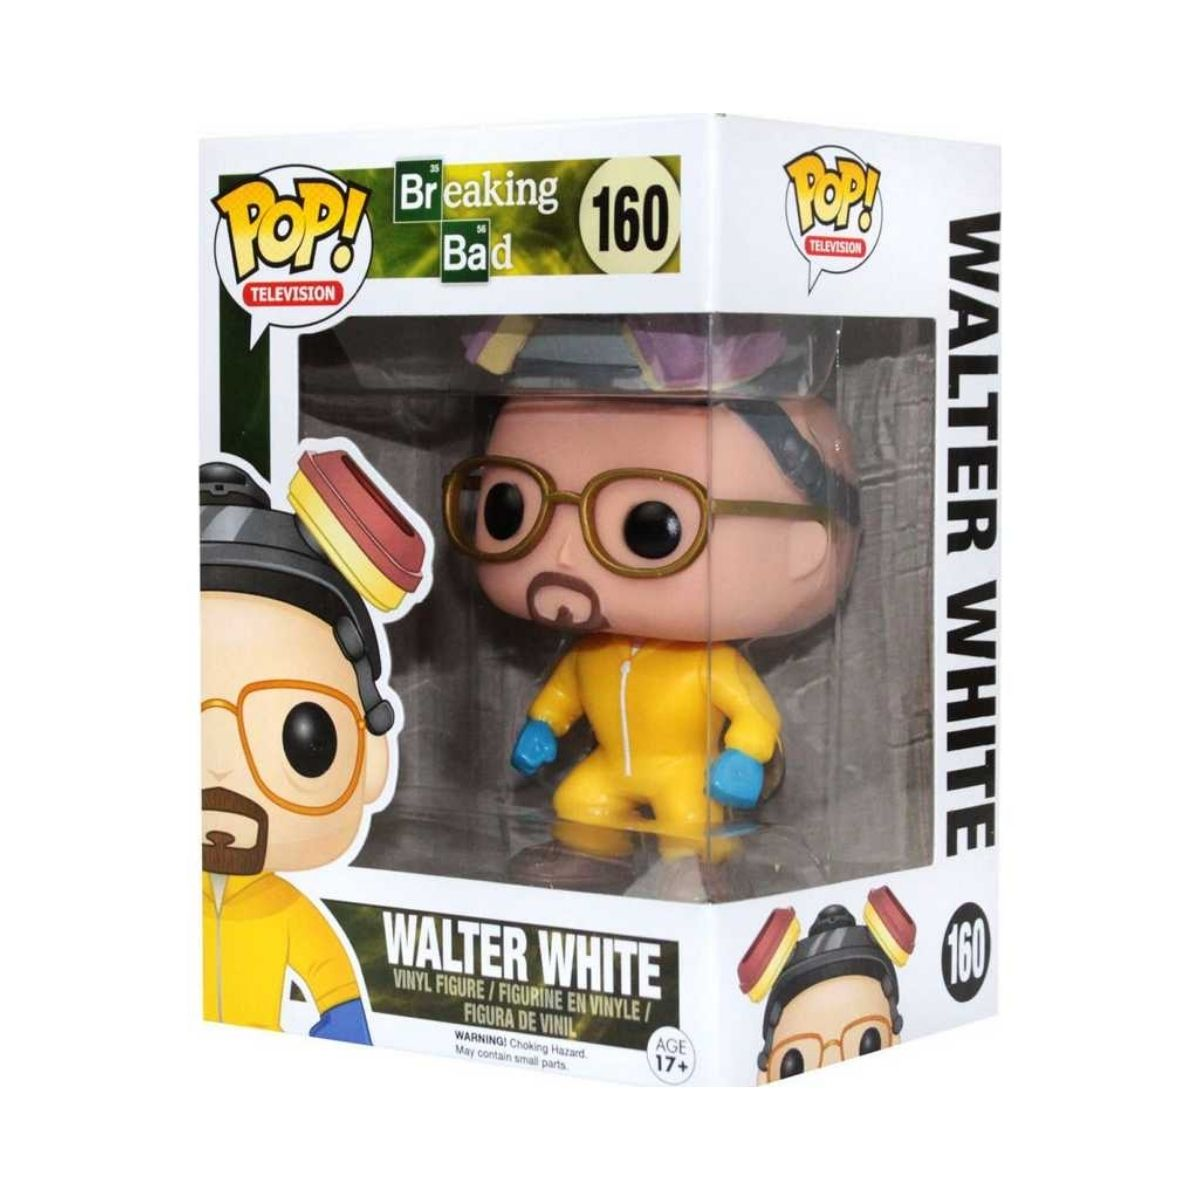 Funko Pop Breaking Bad Walter White #160  - Game Land Brinquedos